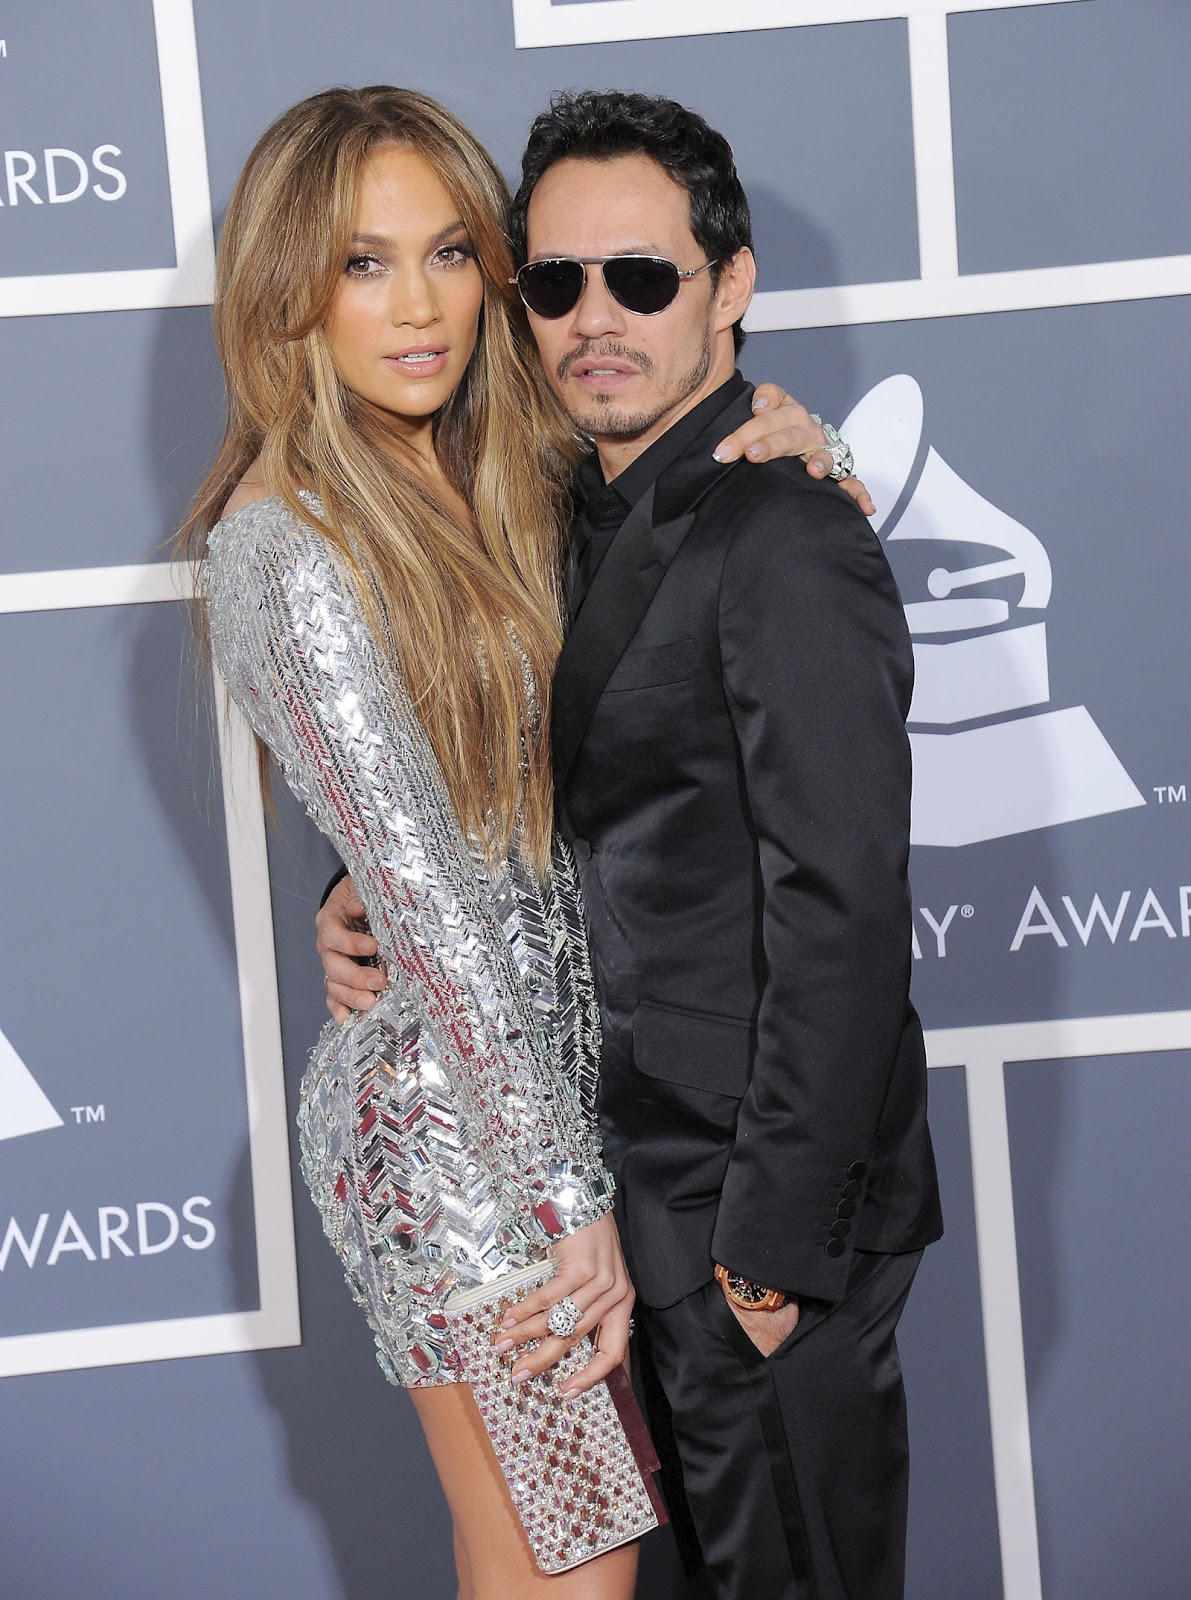 http://1.bp.blogspot.com/-GZrfsElmkqo/UC8EuISc9xI/AAAAAAAAD0Q/T5LxBxQa23w/s1600/Jennifer+Lopez+Grammy+(14).jpg